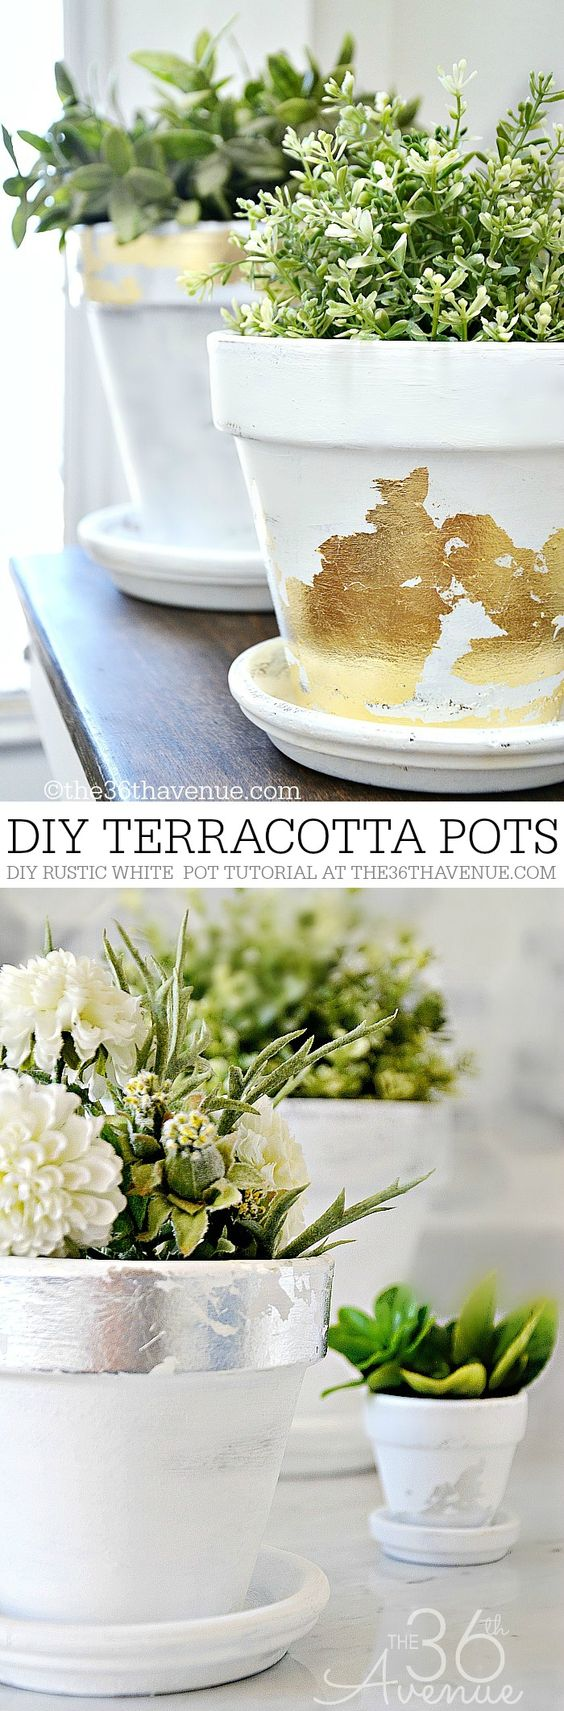 DIY Gold Leaf Terracotta Pots